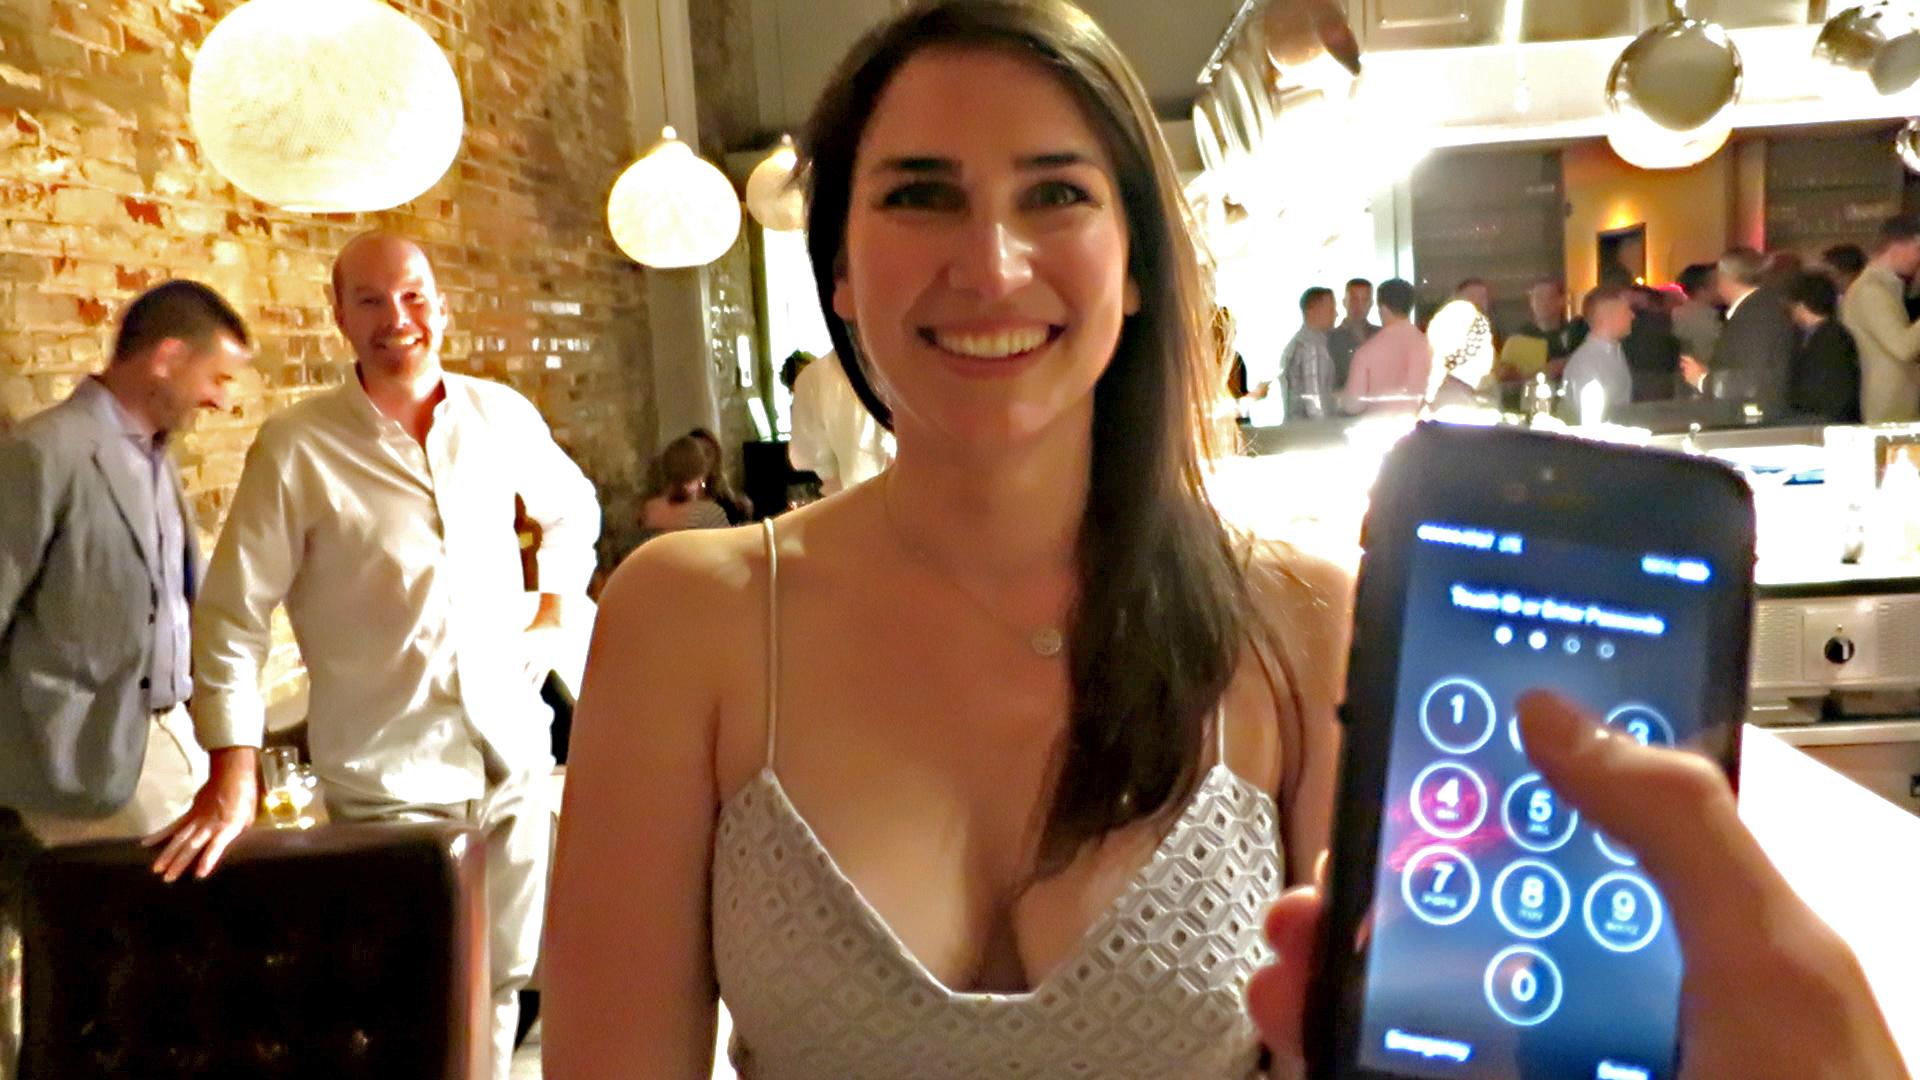 mentalist unlocks iphone at corporate event